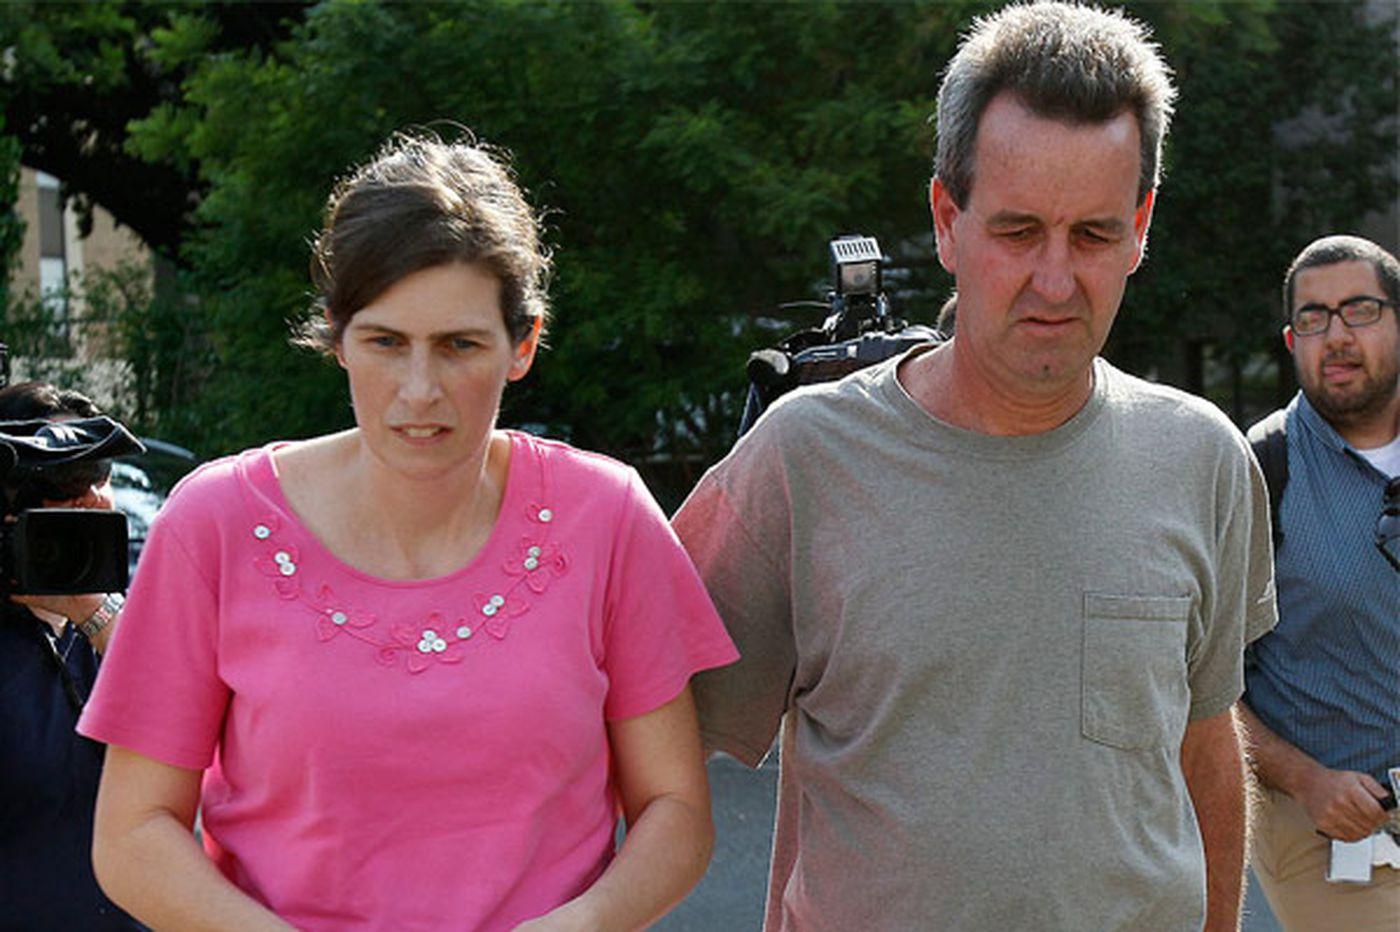 'Faith-healing' mom gets bail while husband remains jailed